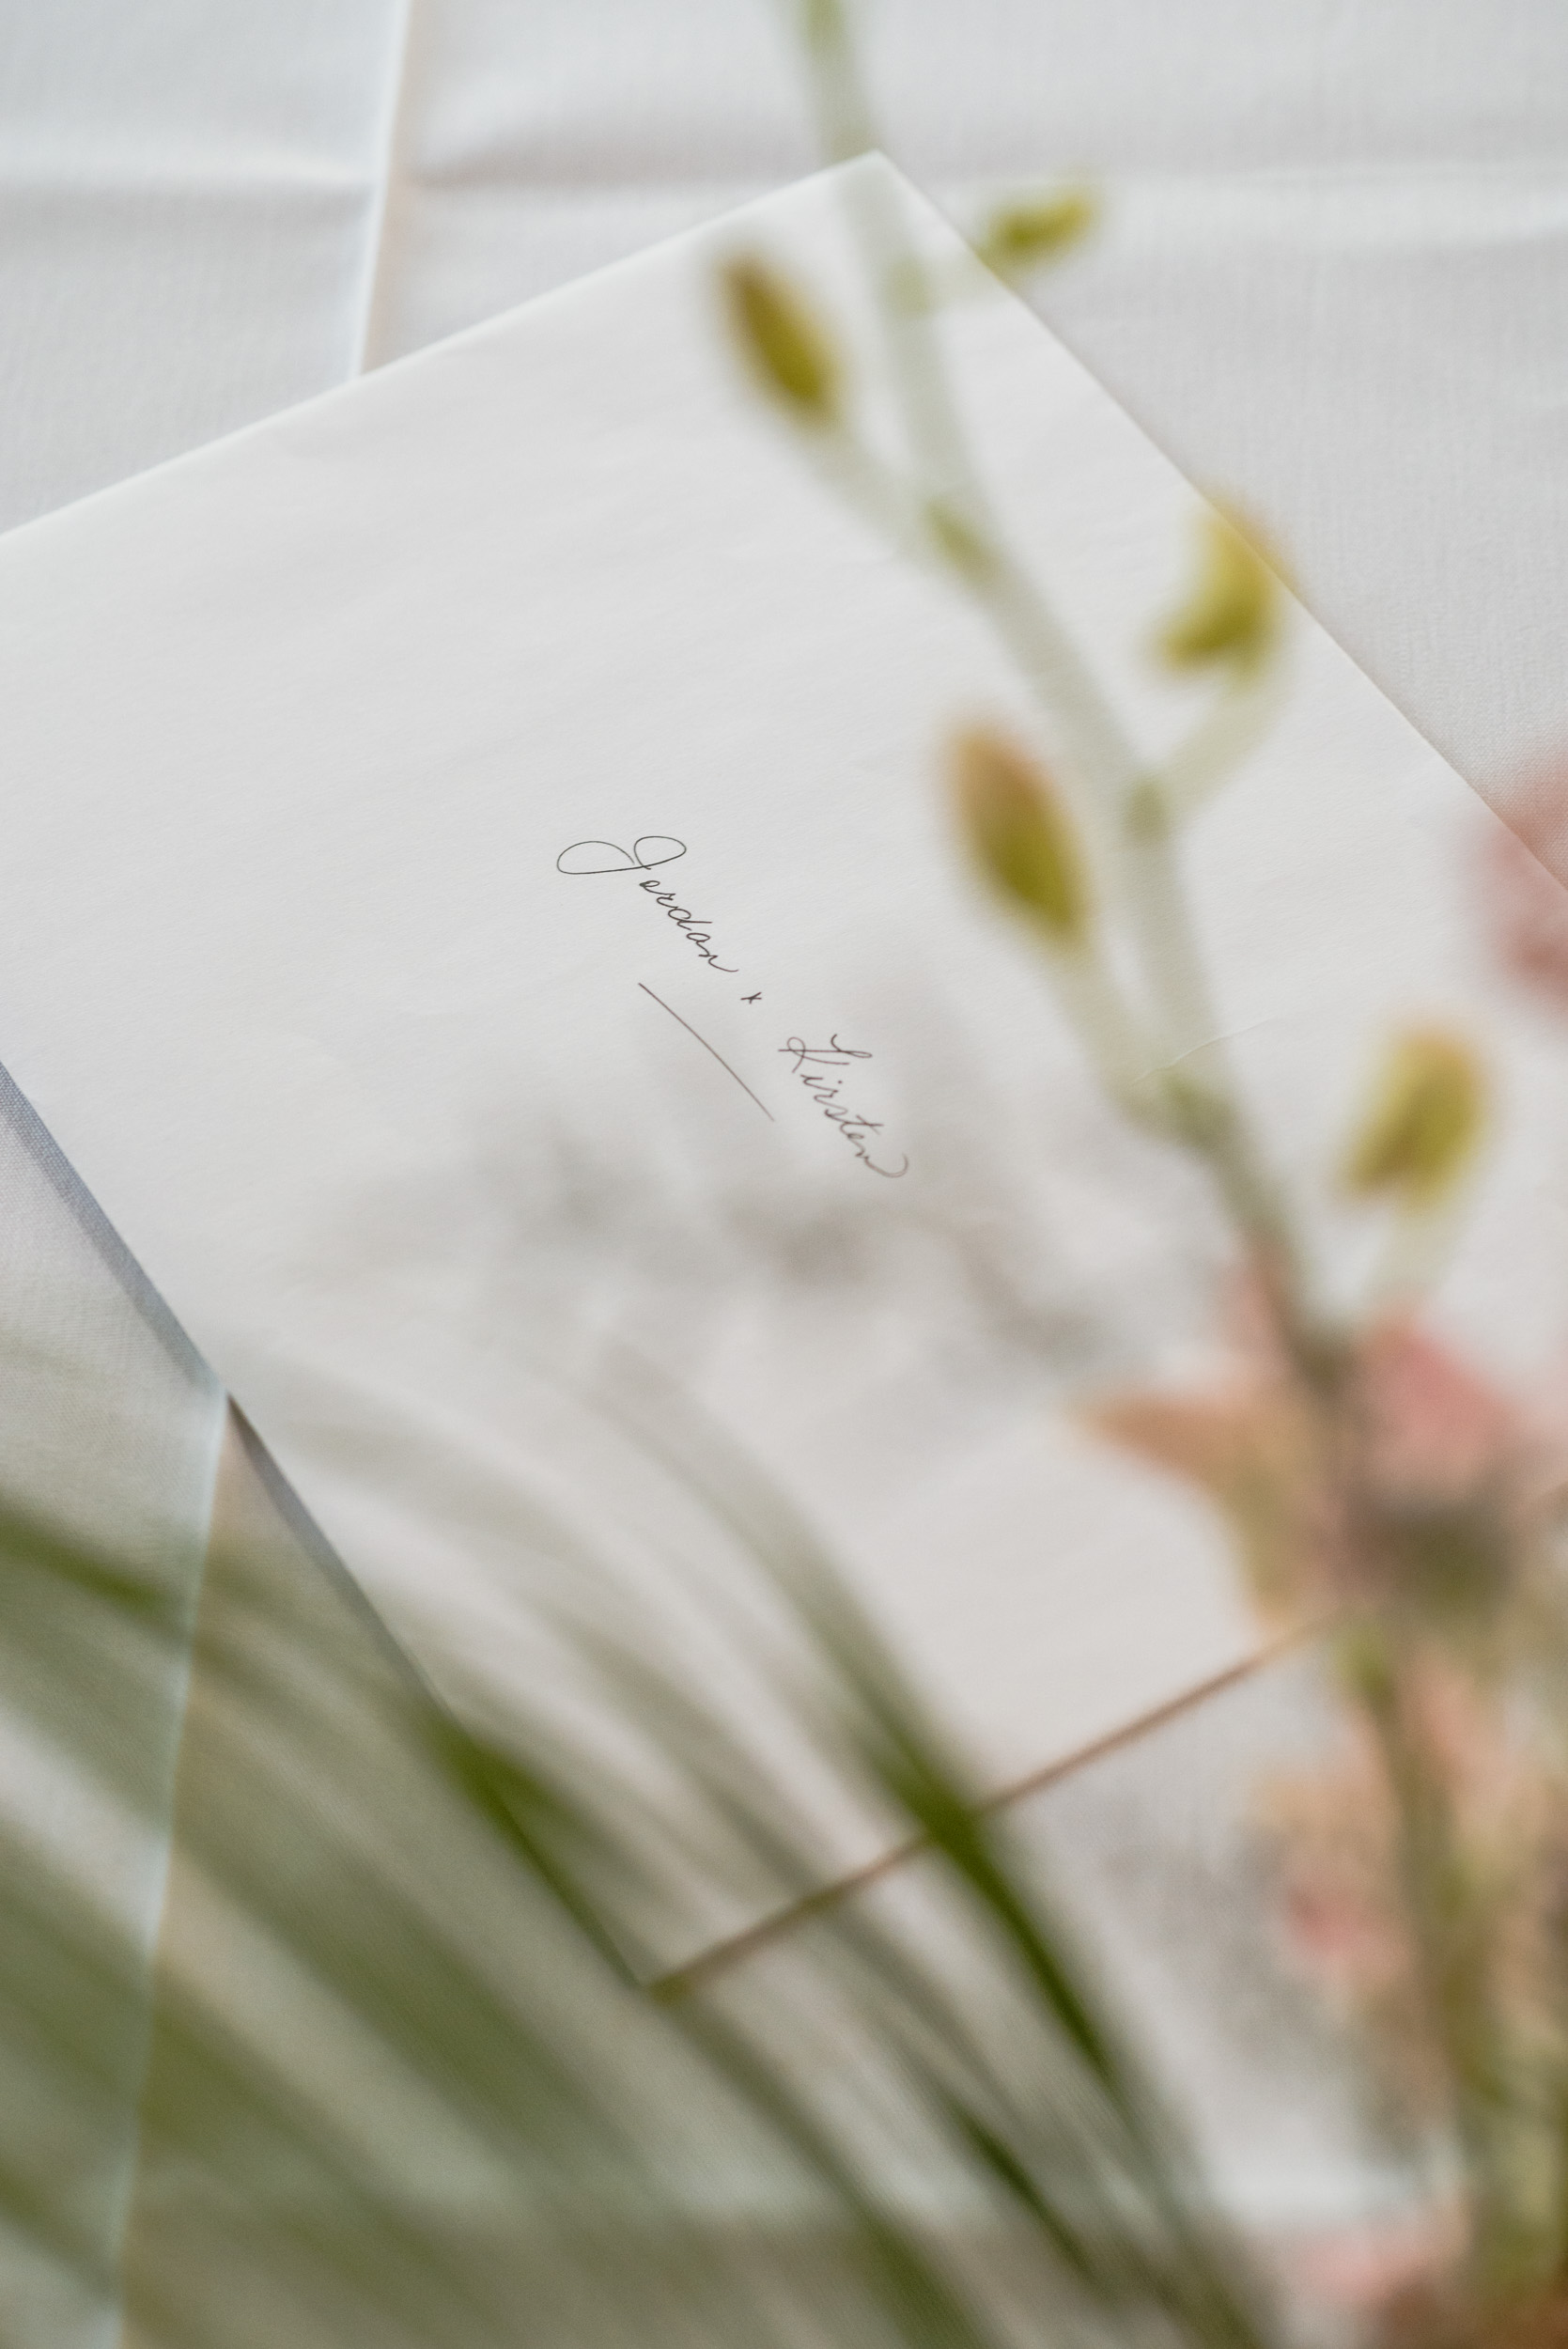 Wedding licence on table